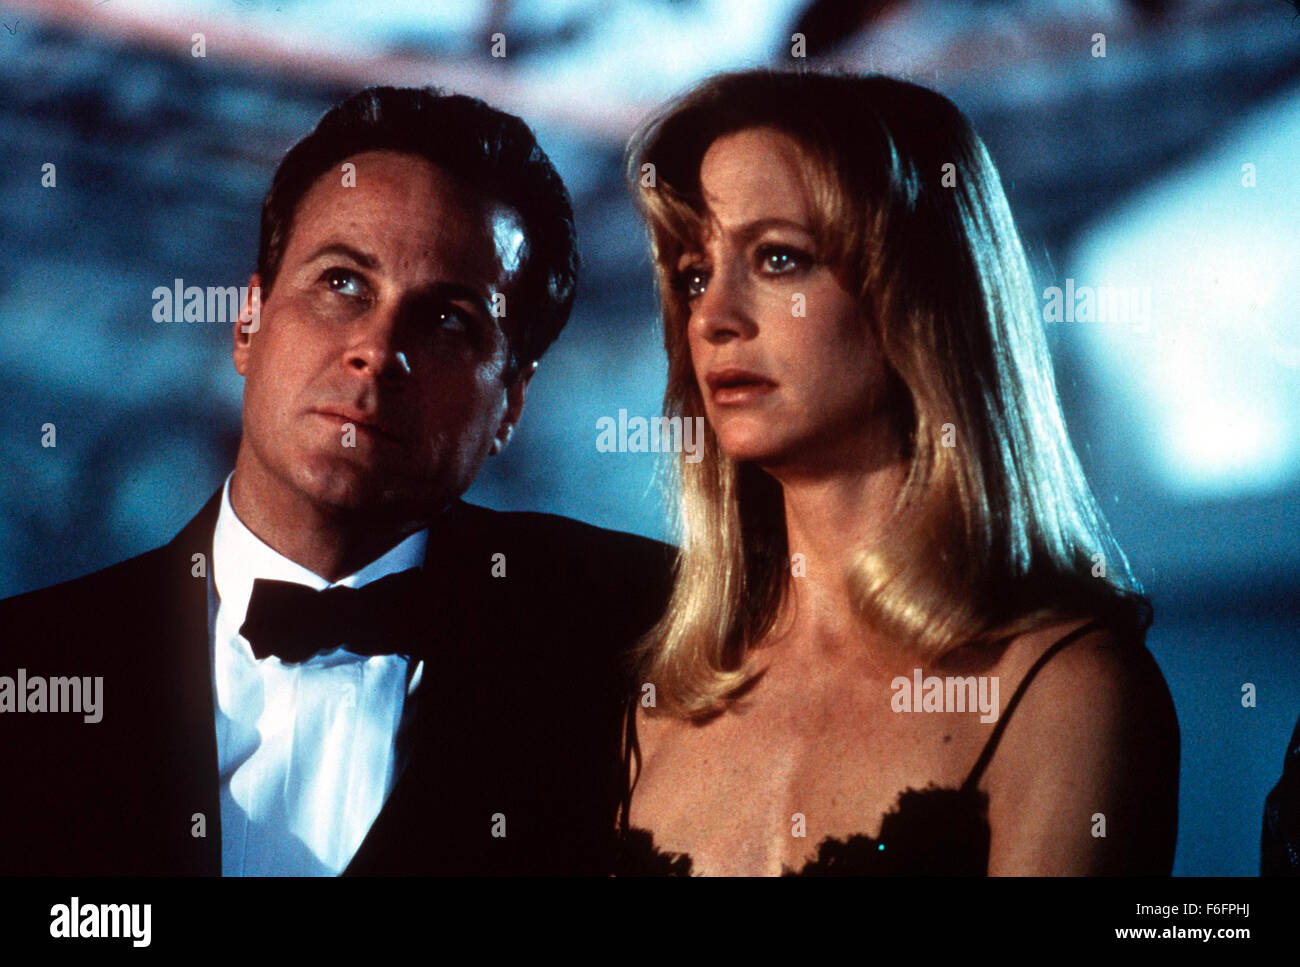 Sep 27 1991 New York Ny Usa Actors Damon Redfern As Maitre D Stock Photo Alamy